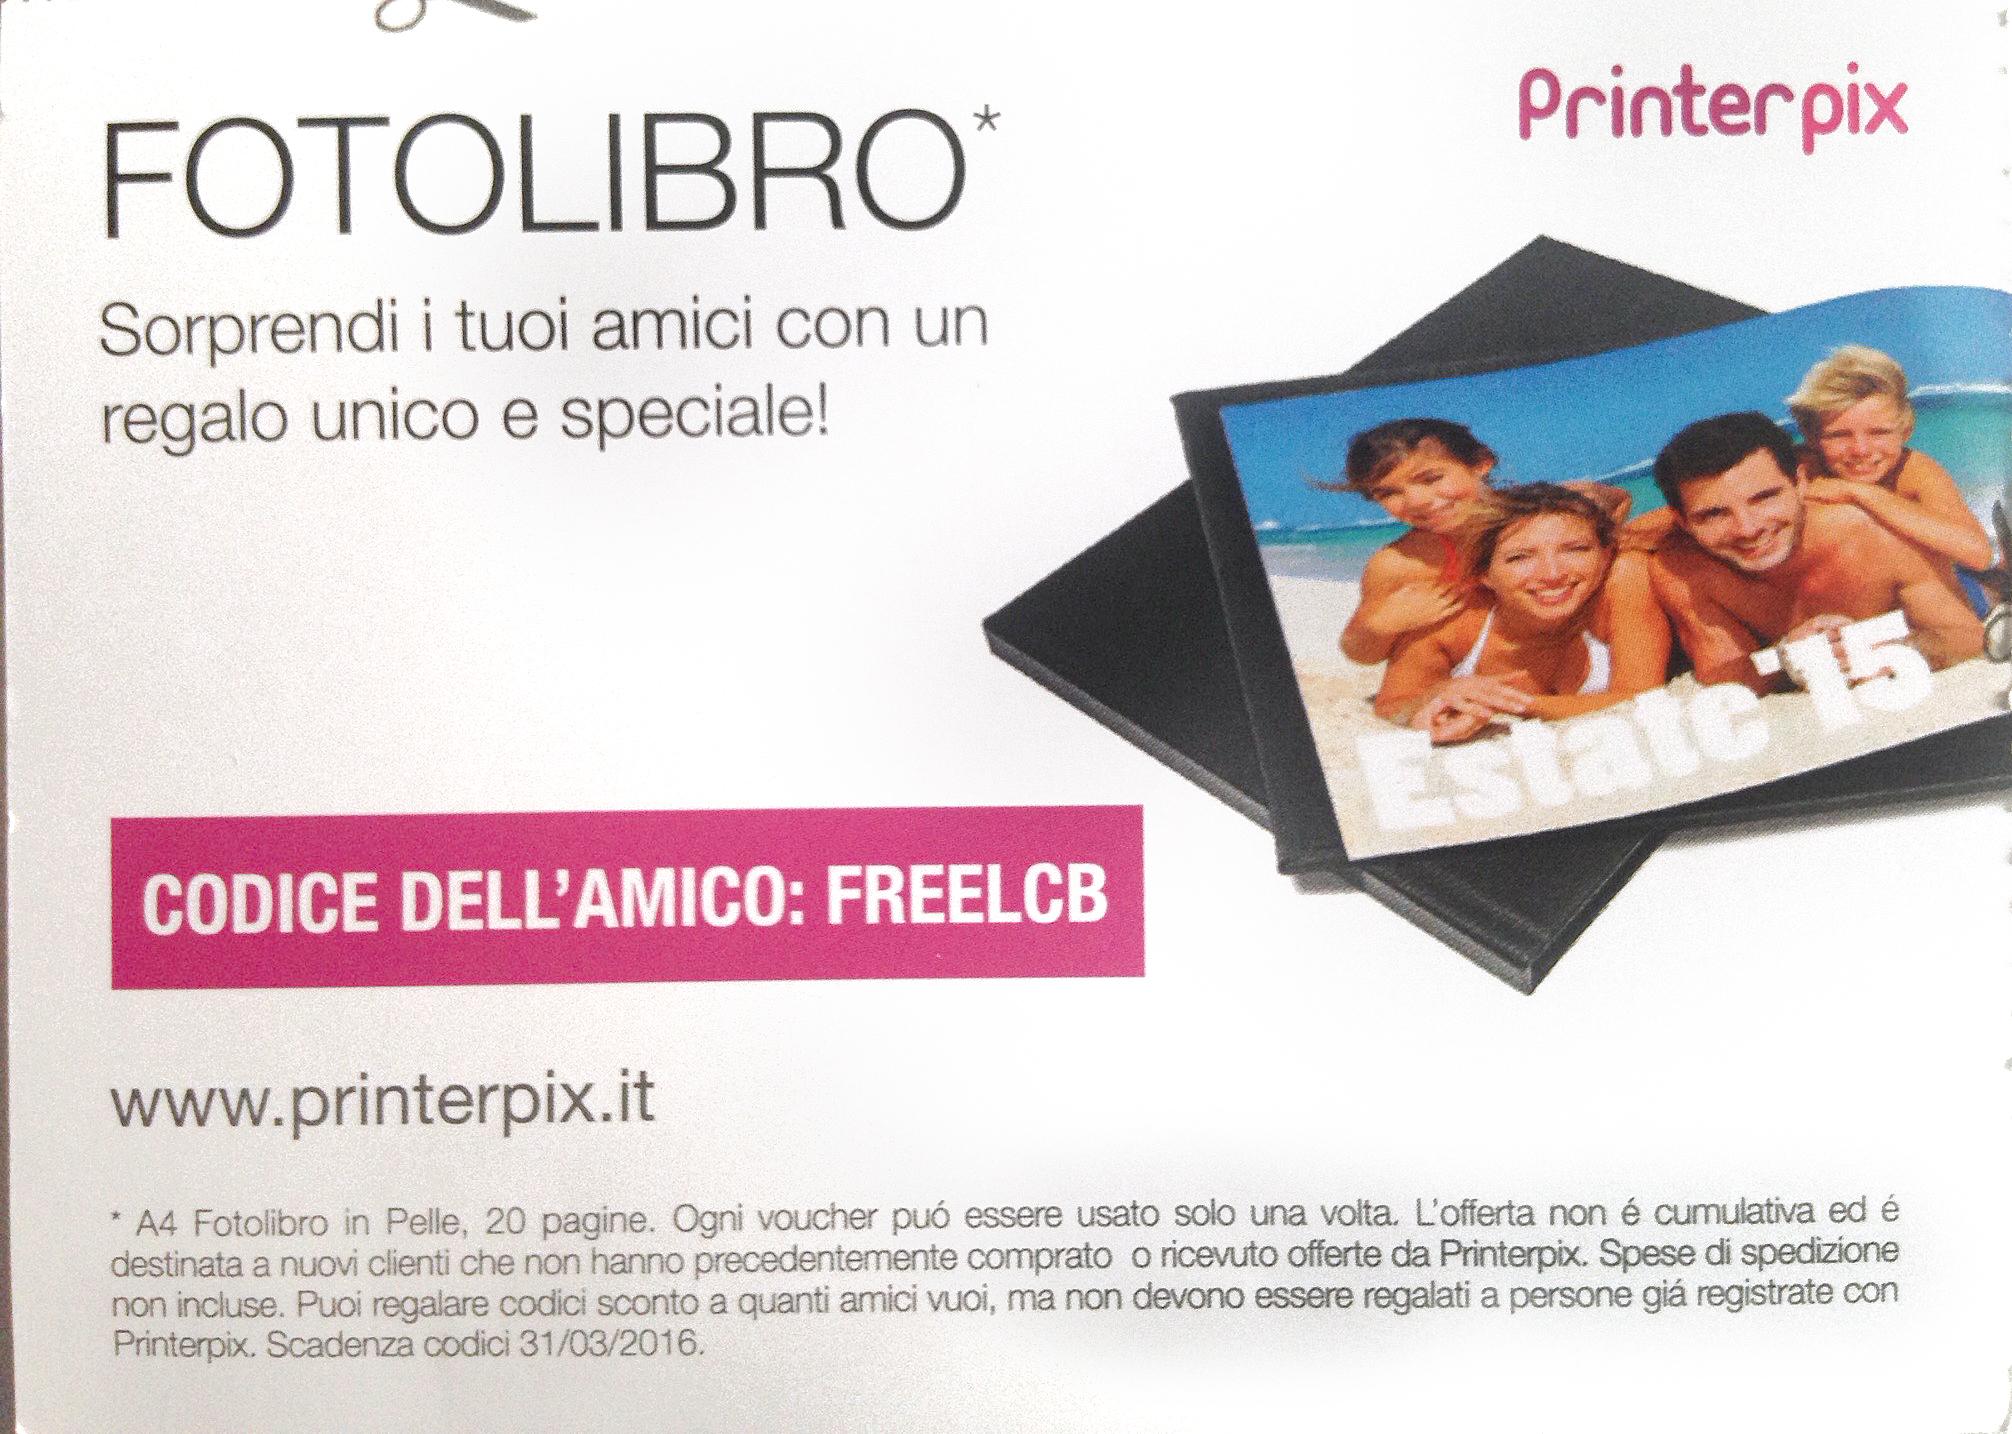 printerpix coupon prodotto gratis omaggio fotolibro